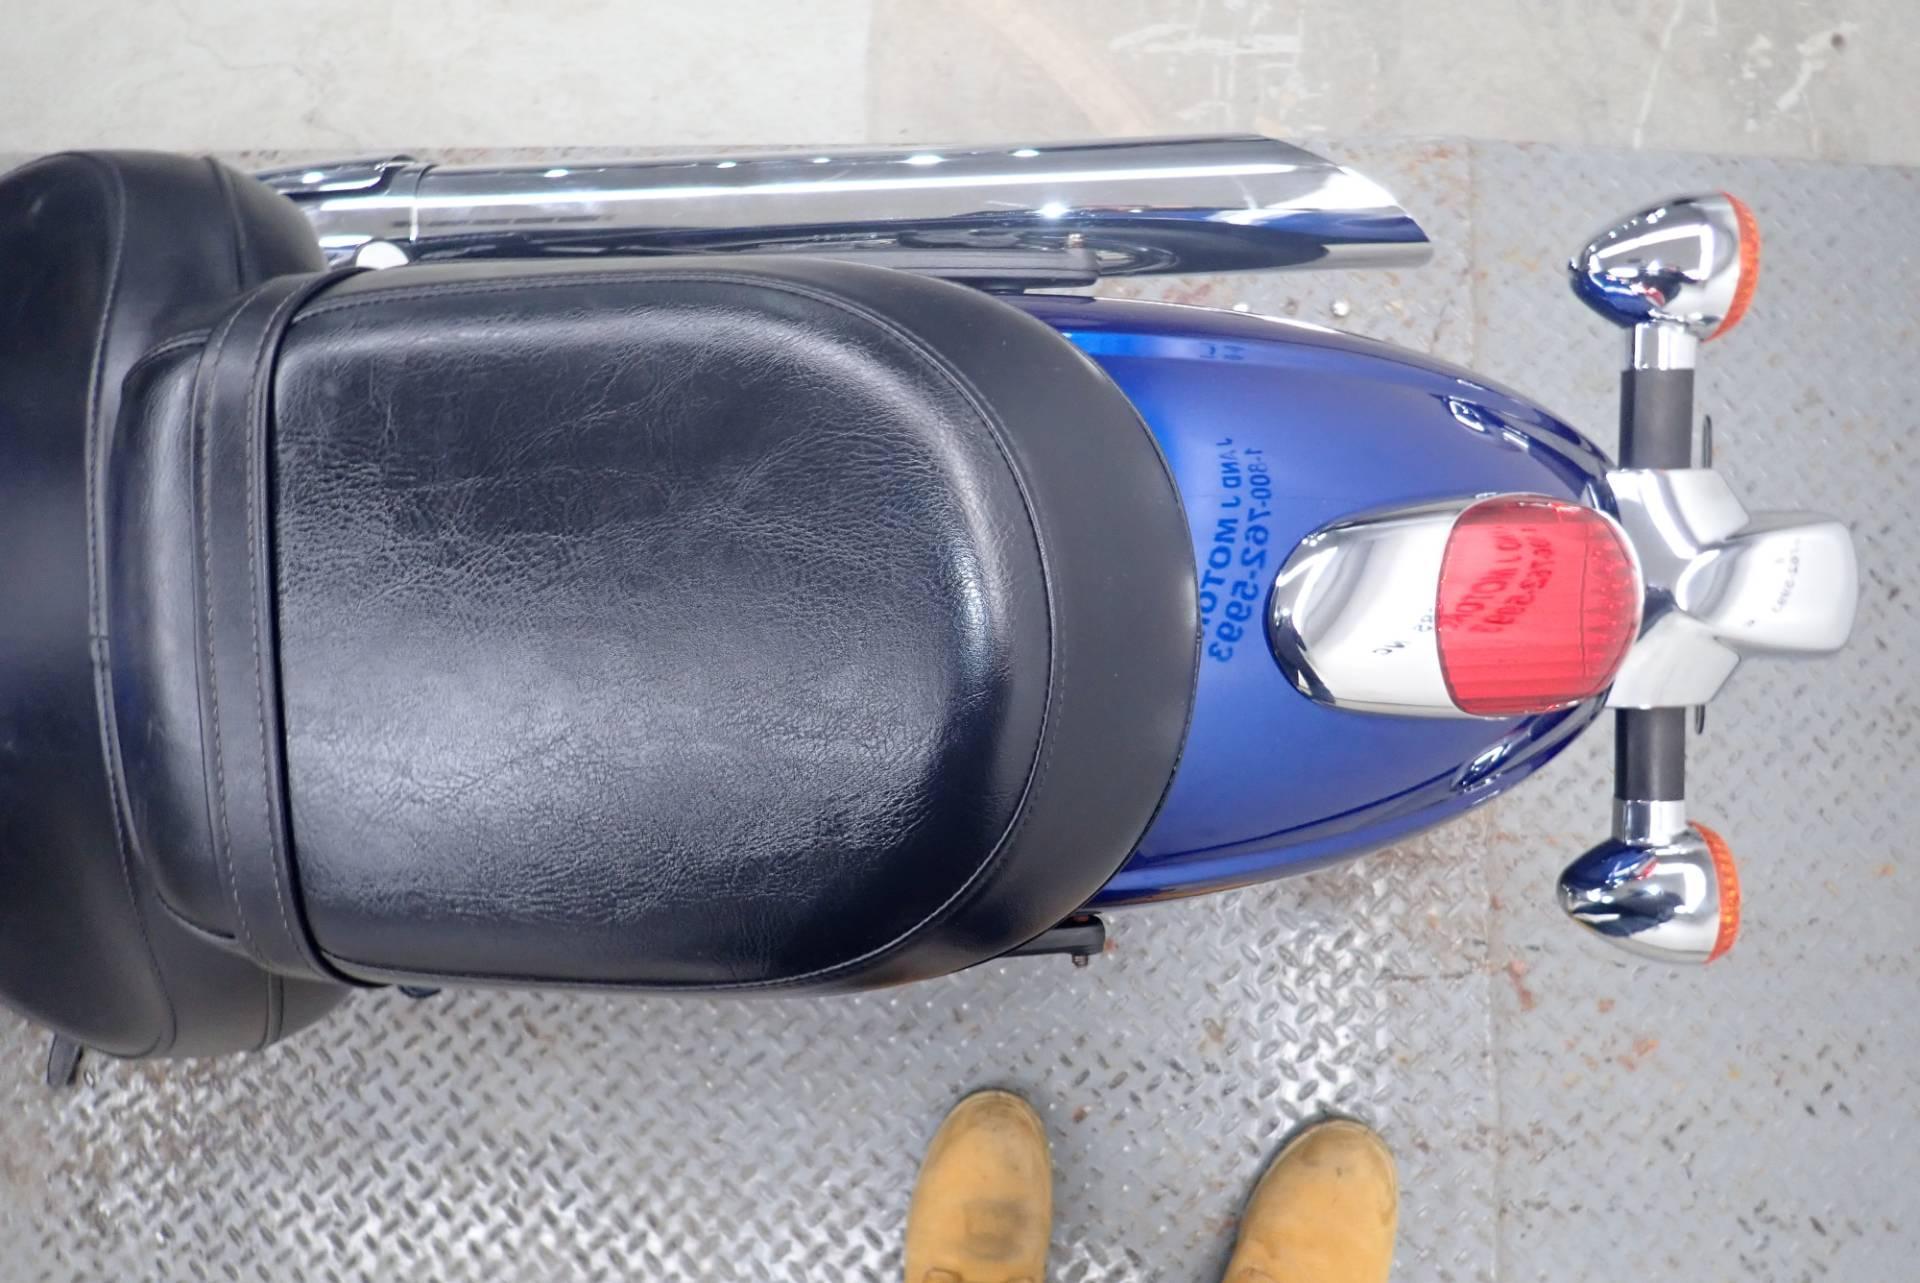 2010 Kawasaki Vulcan 900 Classic 11